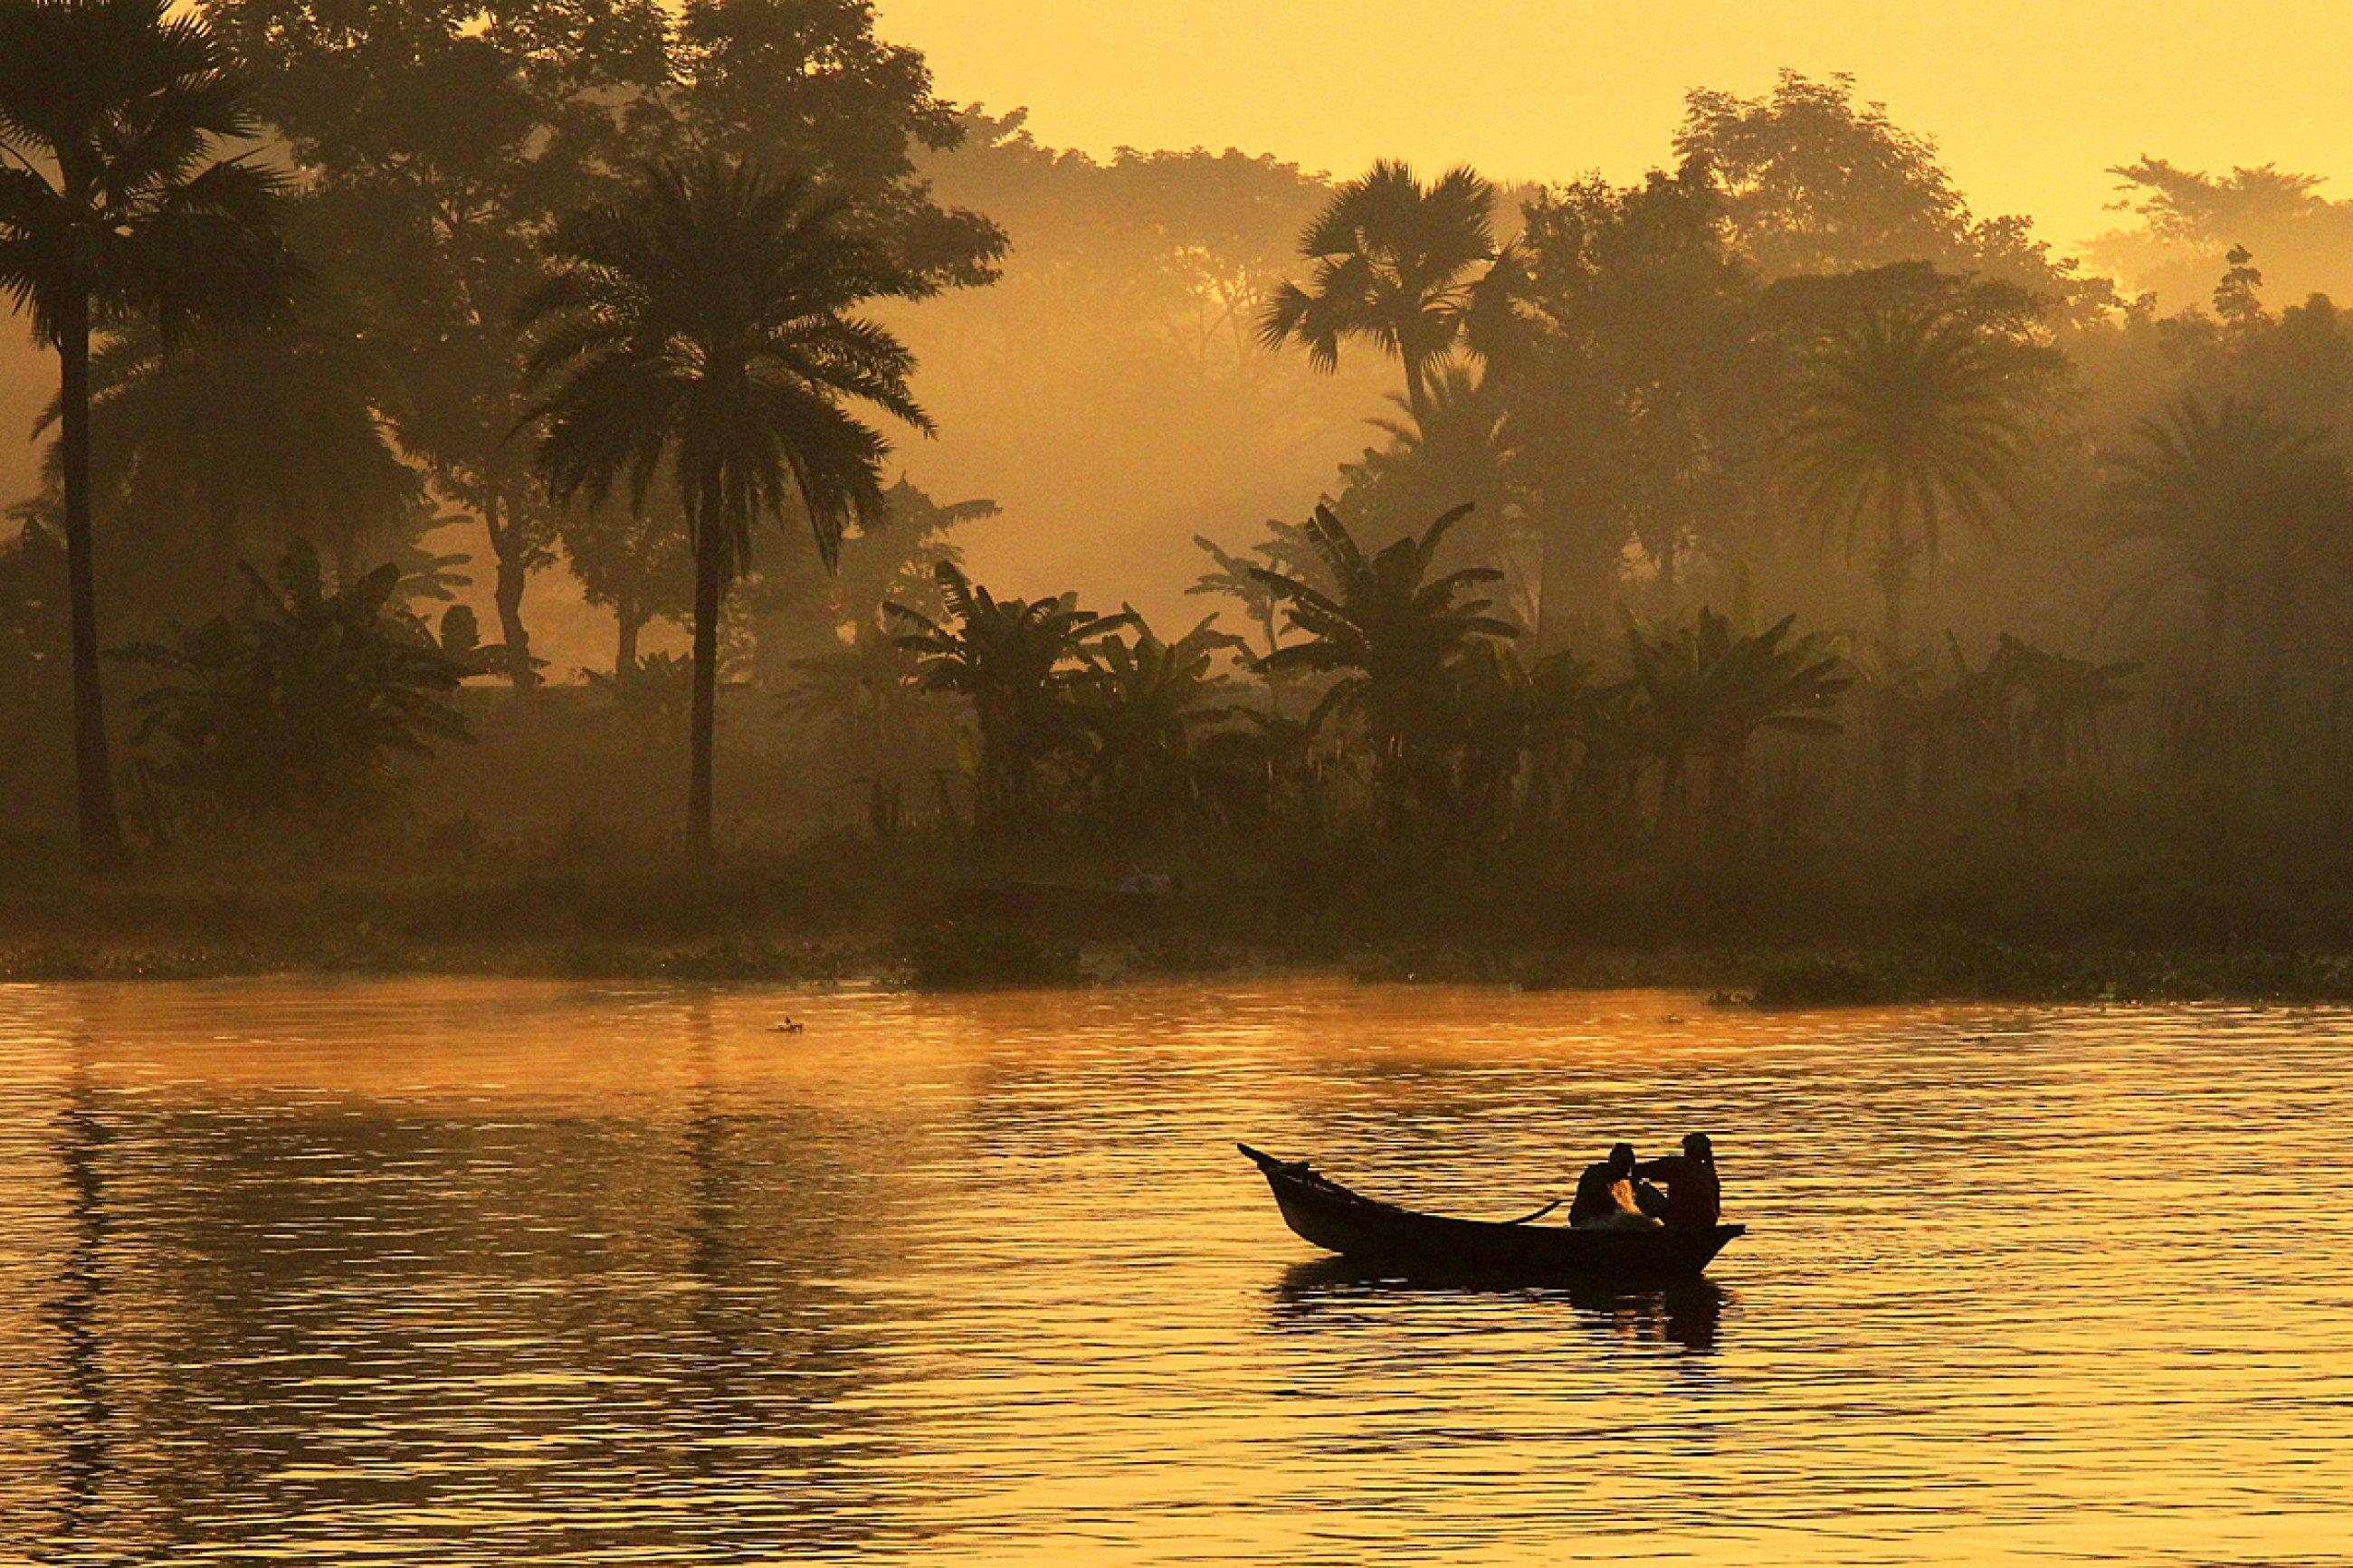 https://bubo.sk/uploads/galleries/7333/dusan-valovic-banglades-rano-na-rieke-padma-1.jpg